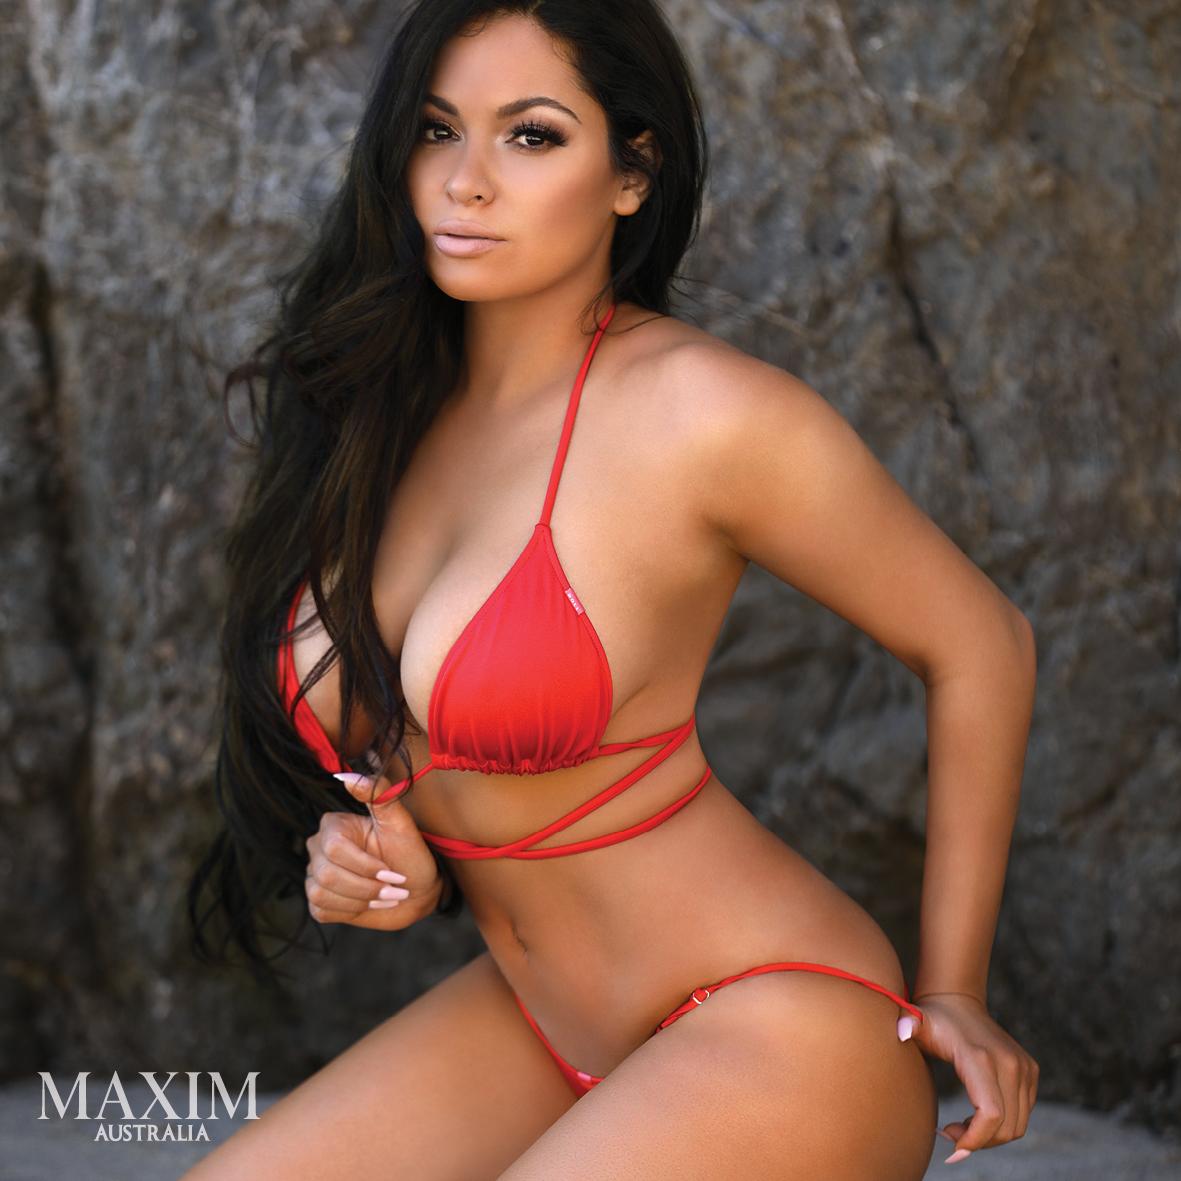 Maxim-Australia-Eliana-Brasil-3